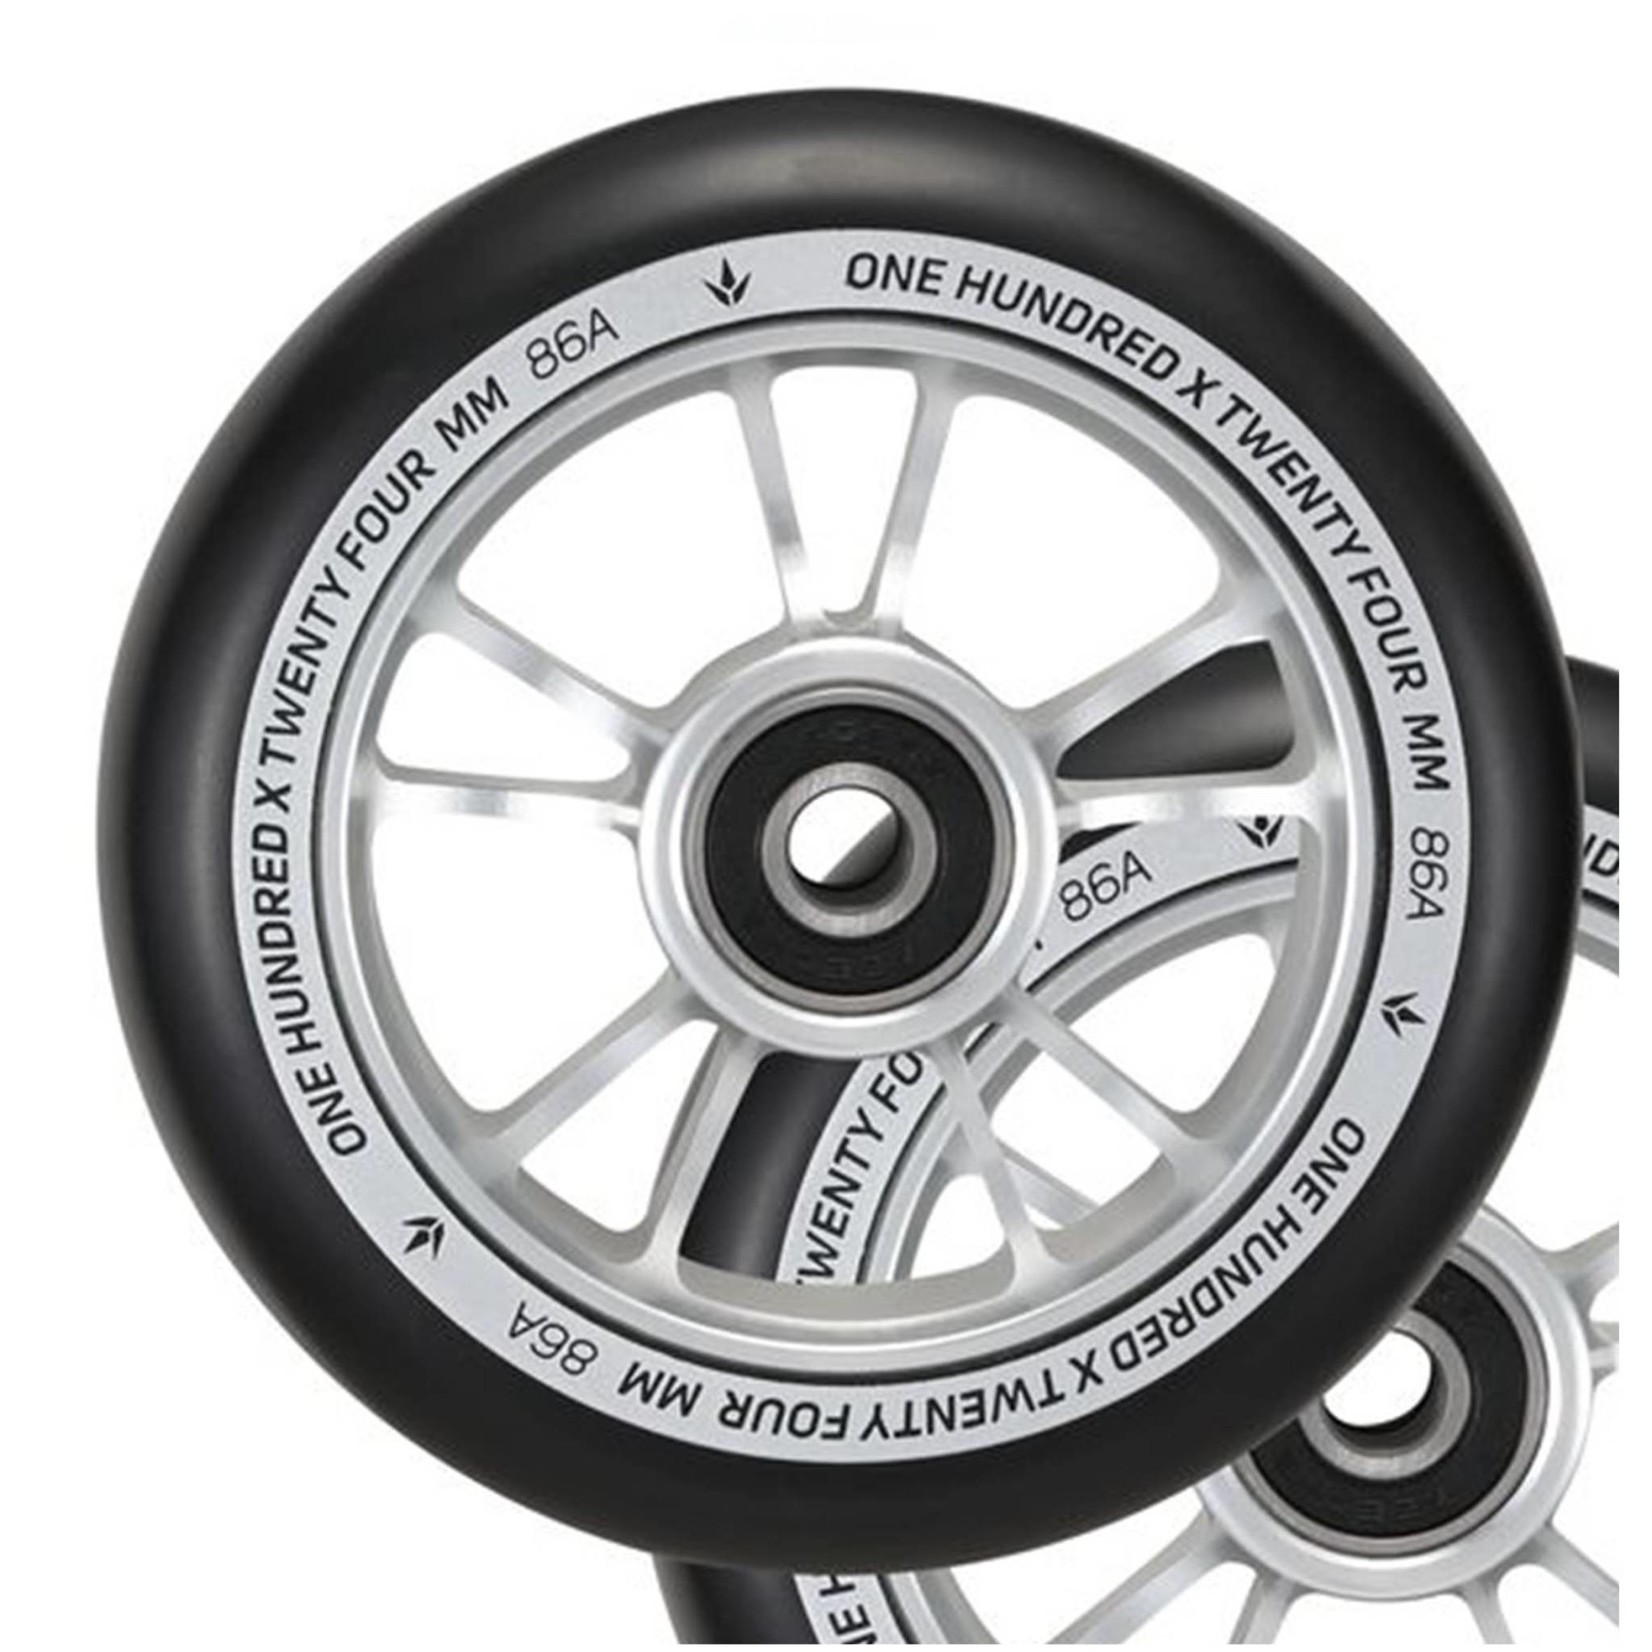 ENVY Envy 100mm Scooter Wheel Silver/Black